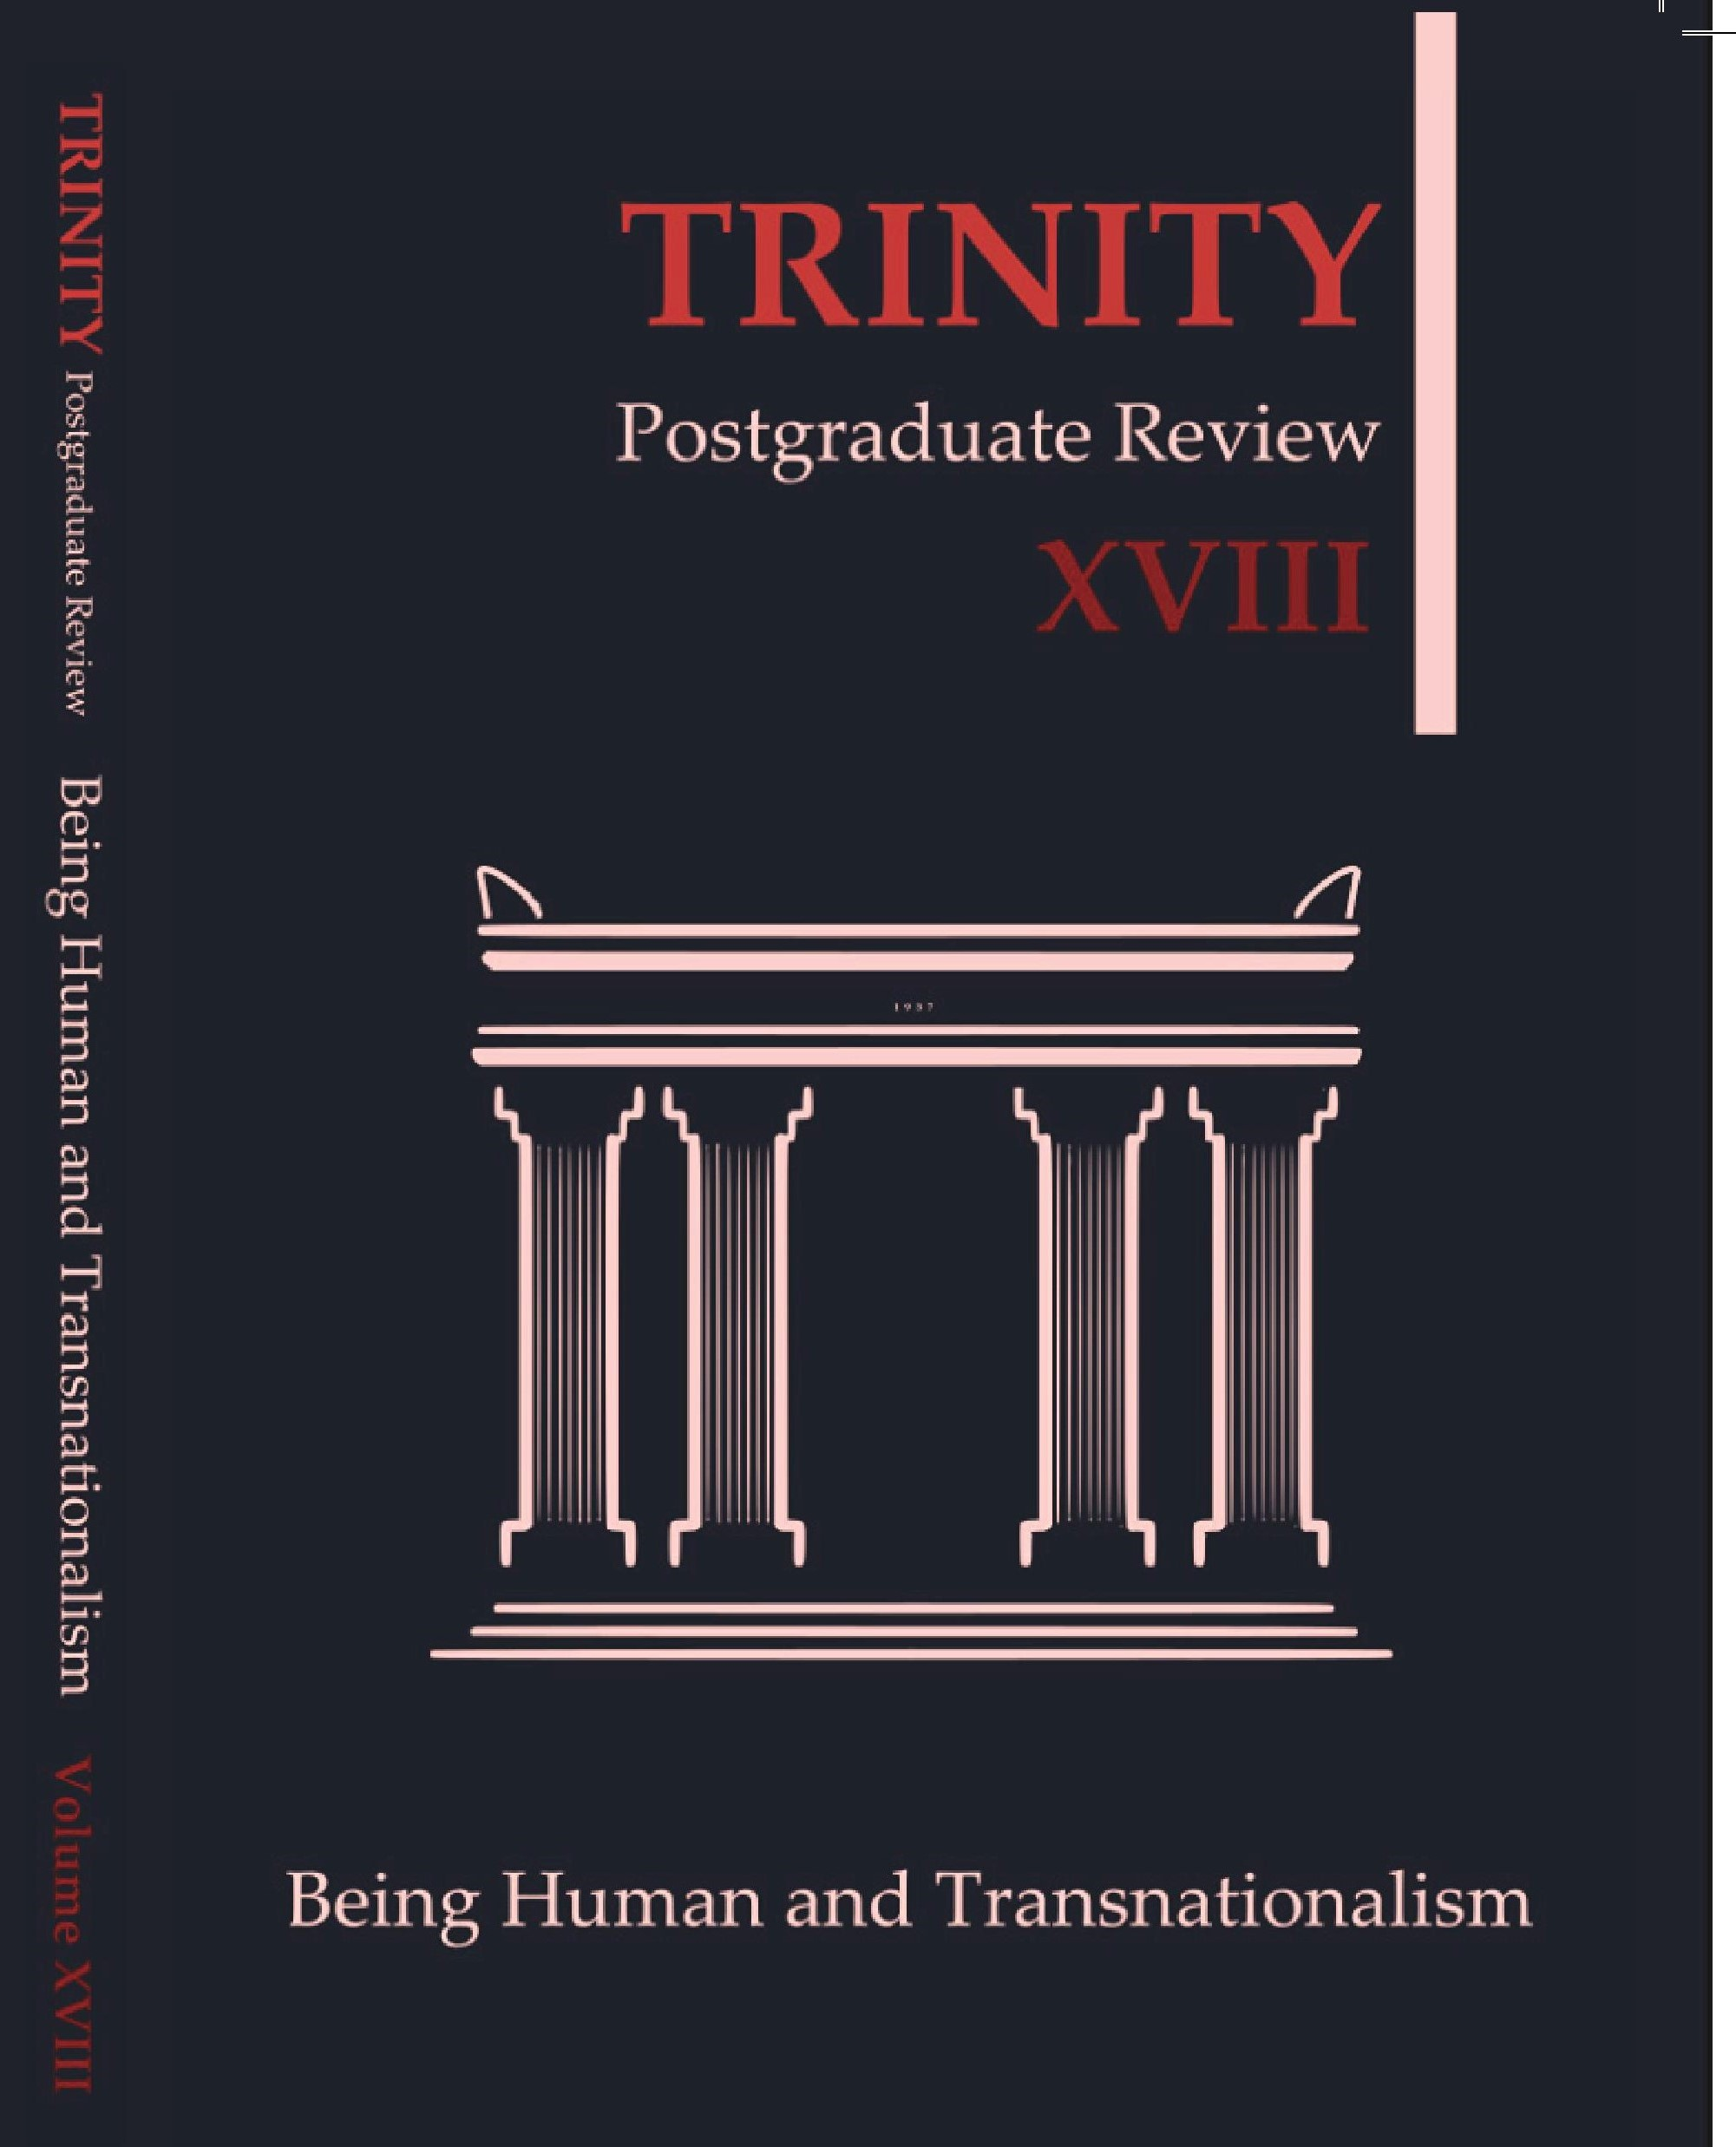 Trinity Postgraduate Review Journal